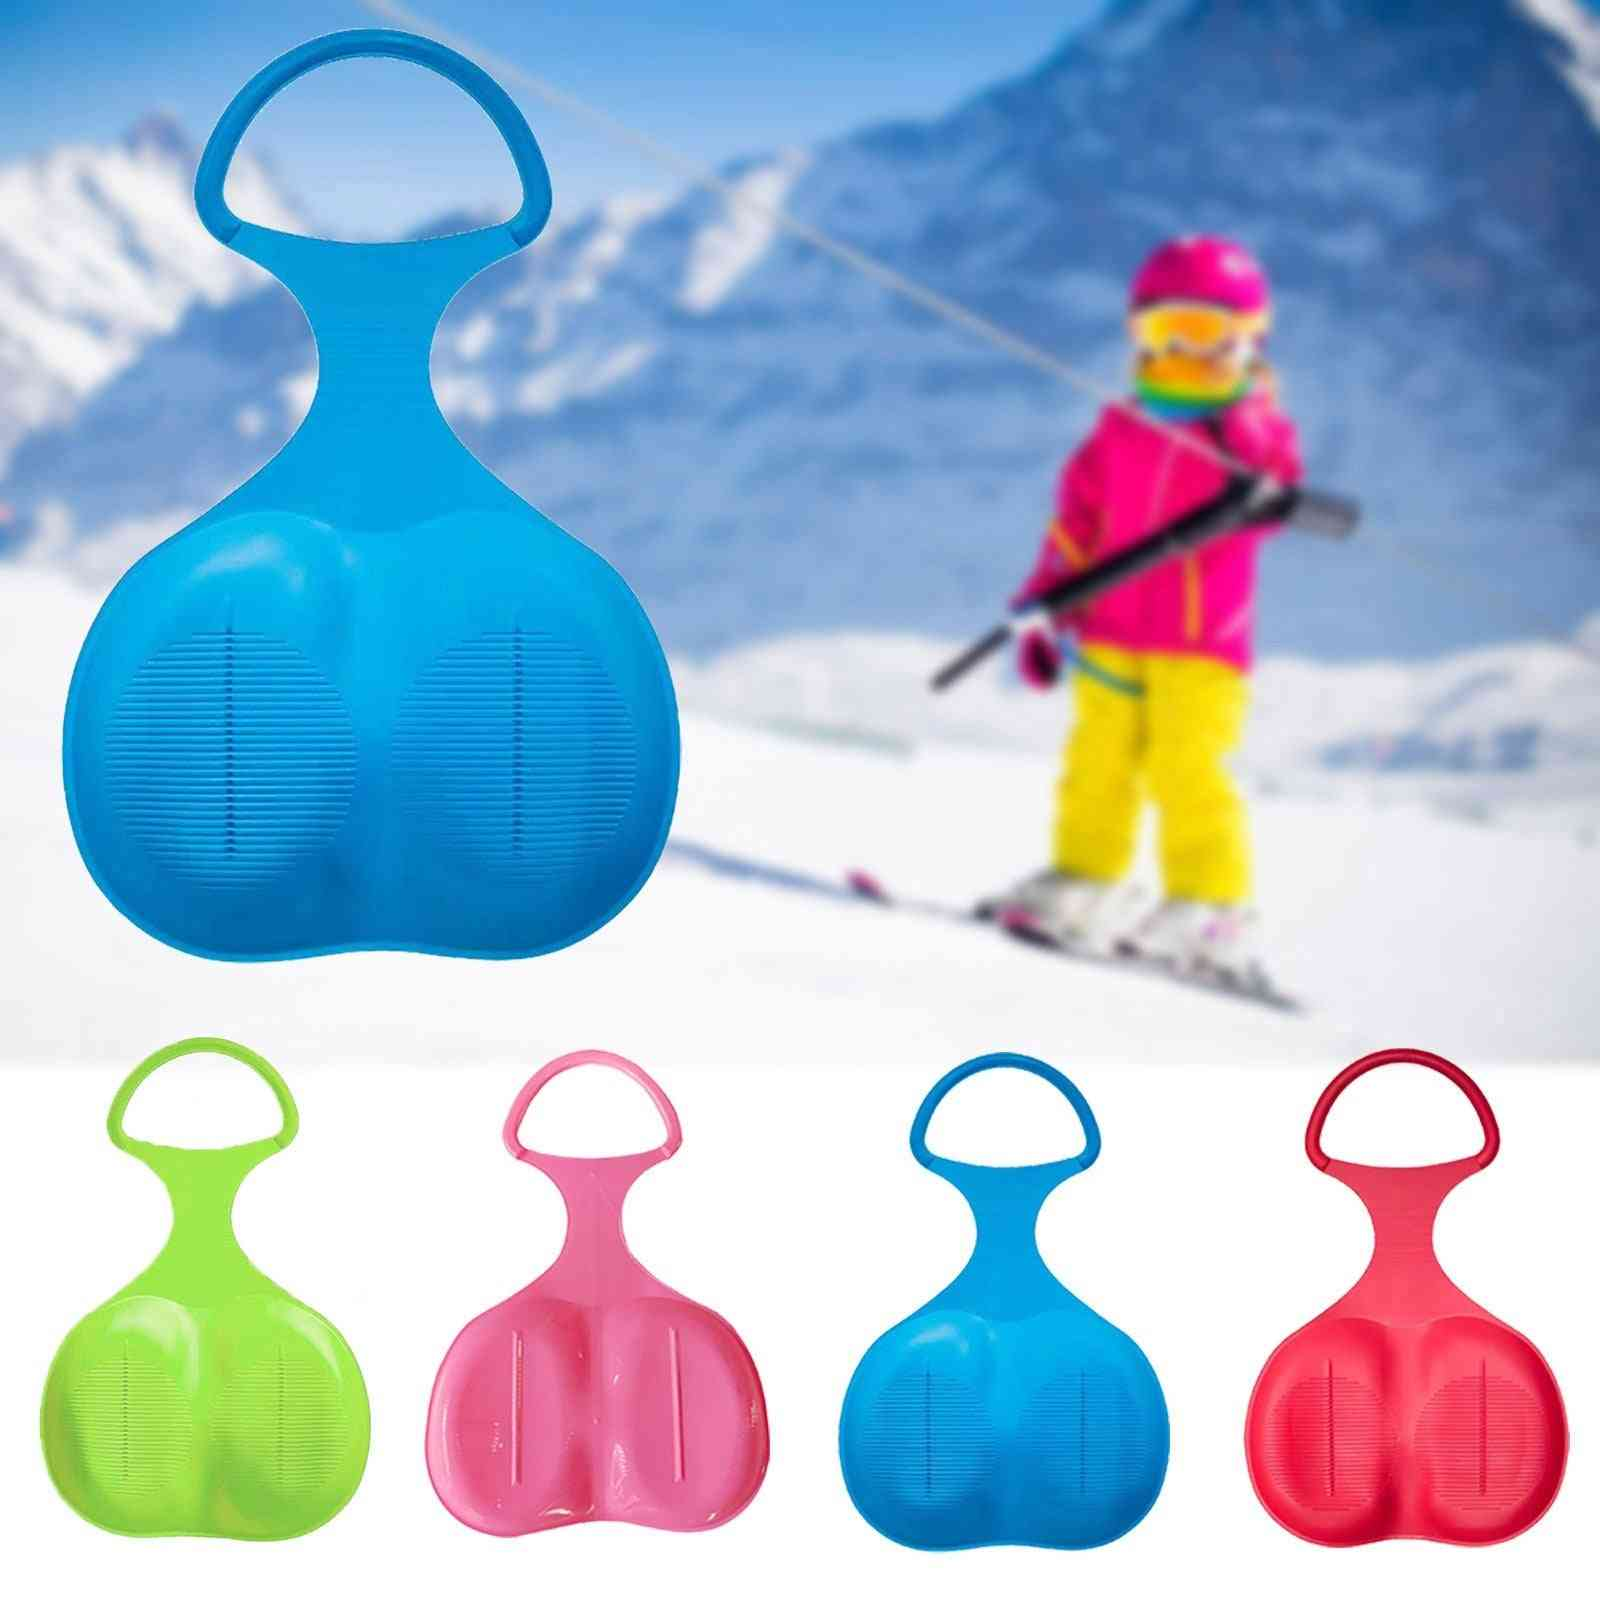 Winter Outdoor Sport Thicken Kids, Adult, Snow Sled Sledge, Ski Board Sleigh, Outdoor Grass Plastic Boards Sand Slider, Snow Luge